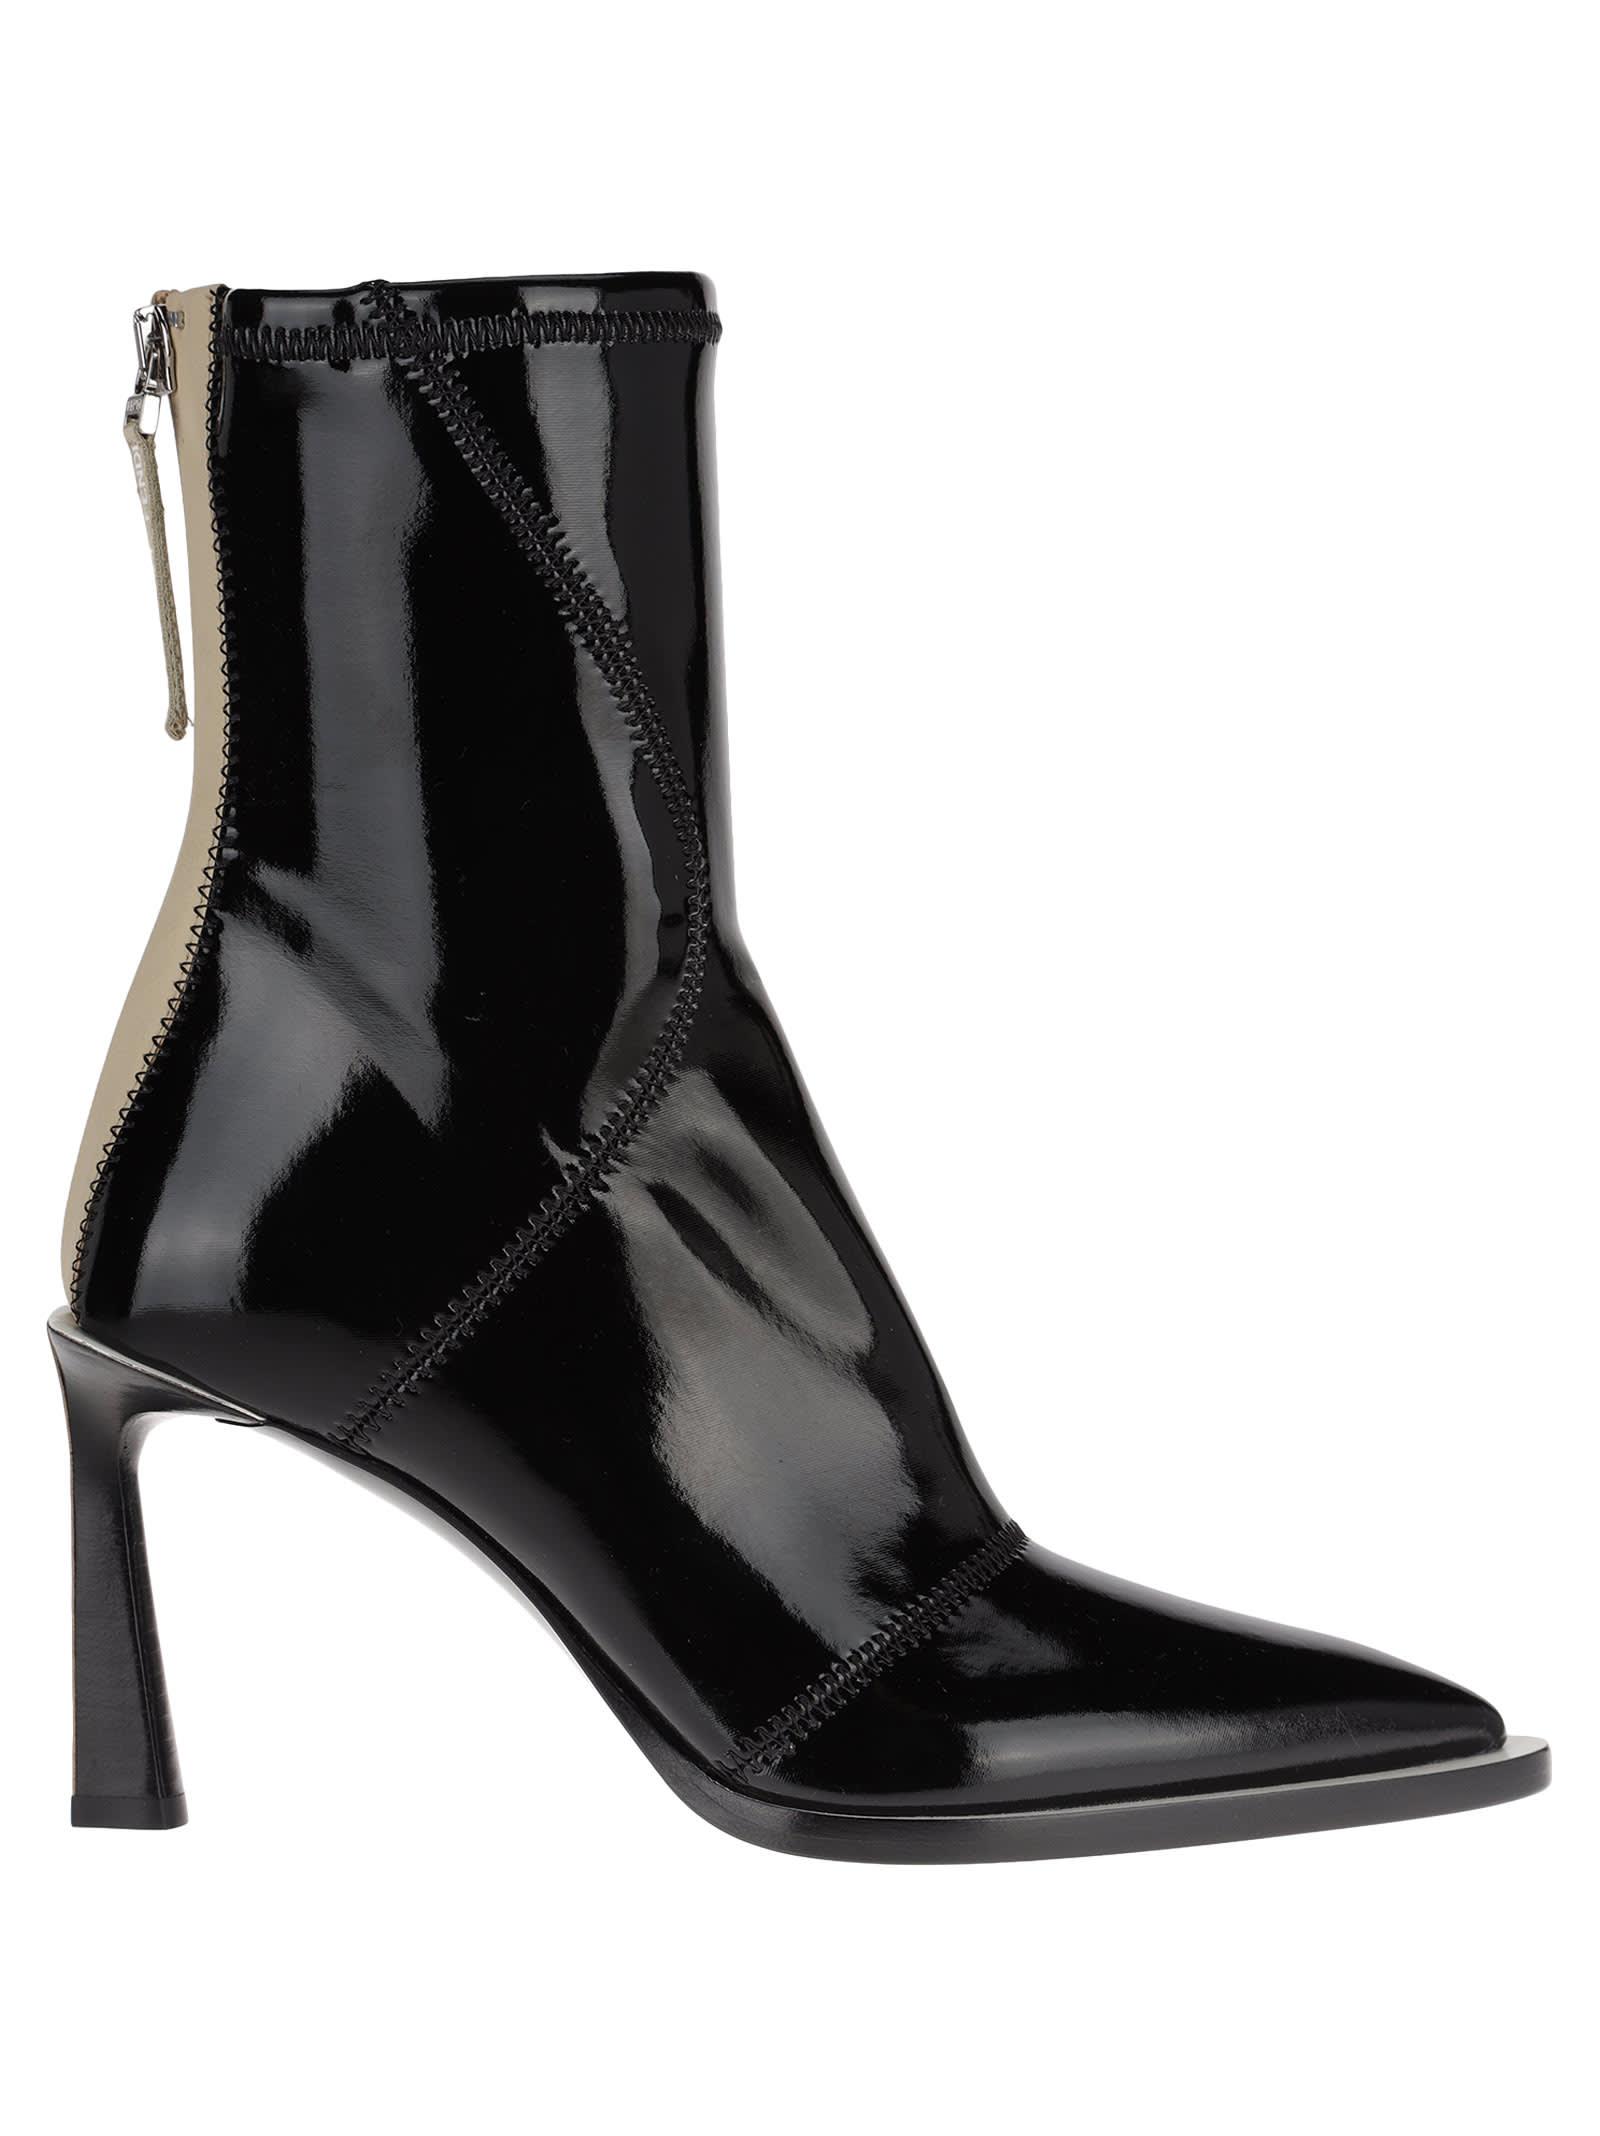 Black Glossy Pointed Toe Stiletto Heels